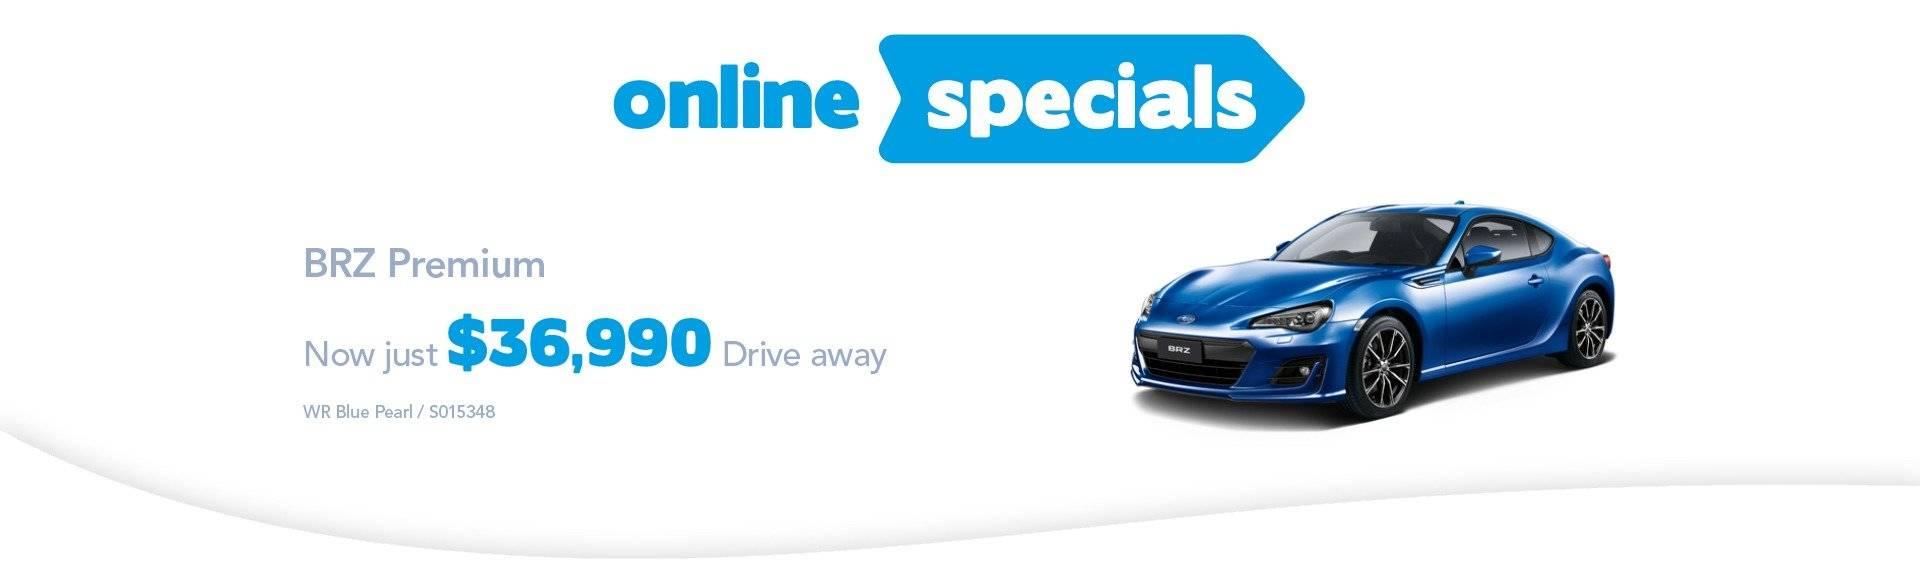 Crossroads Online Special